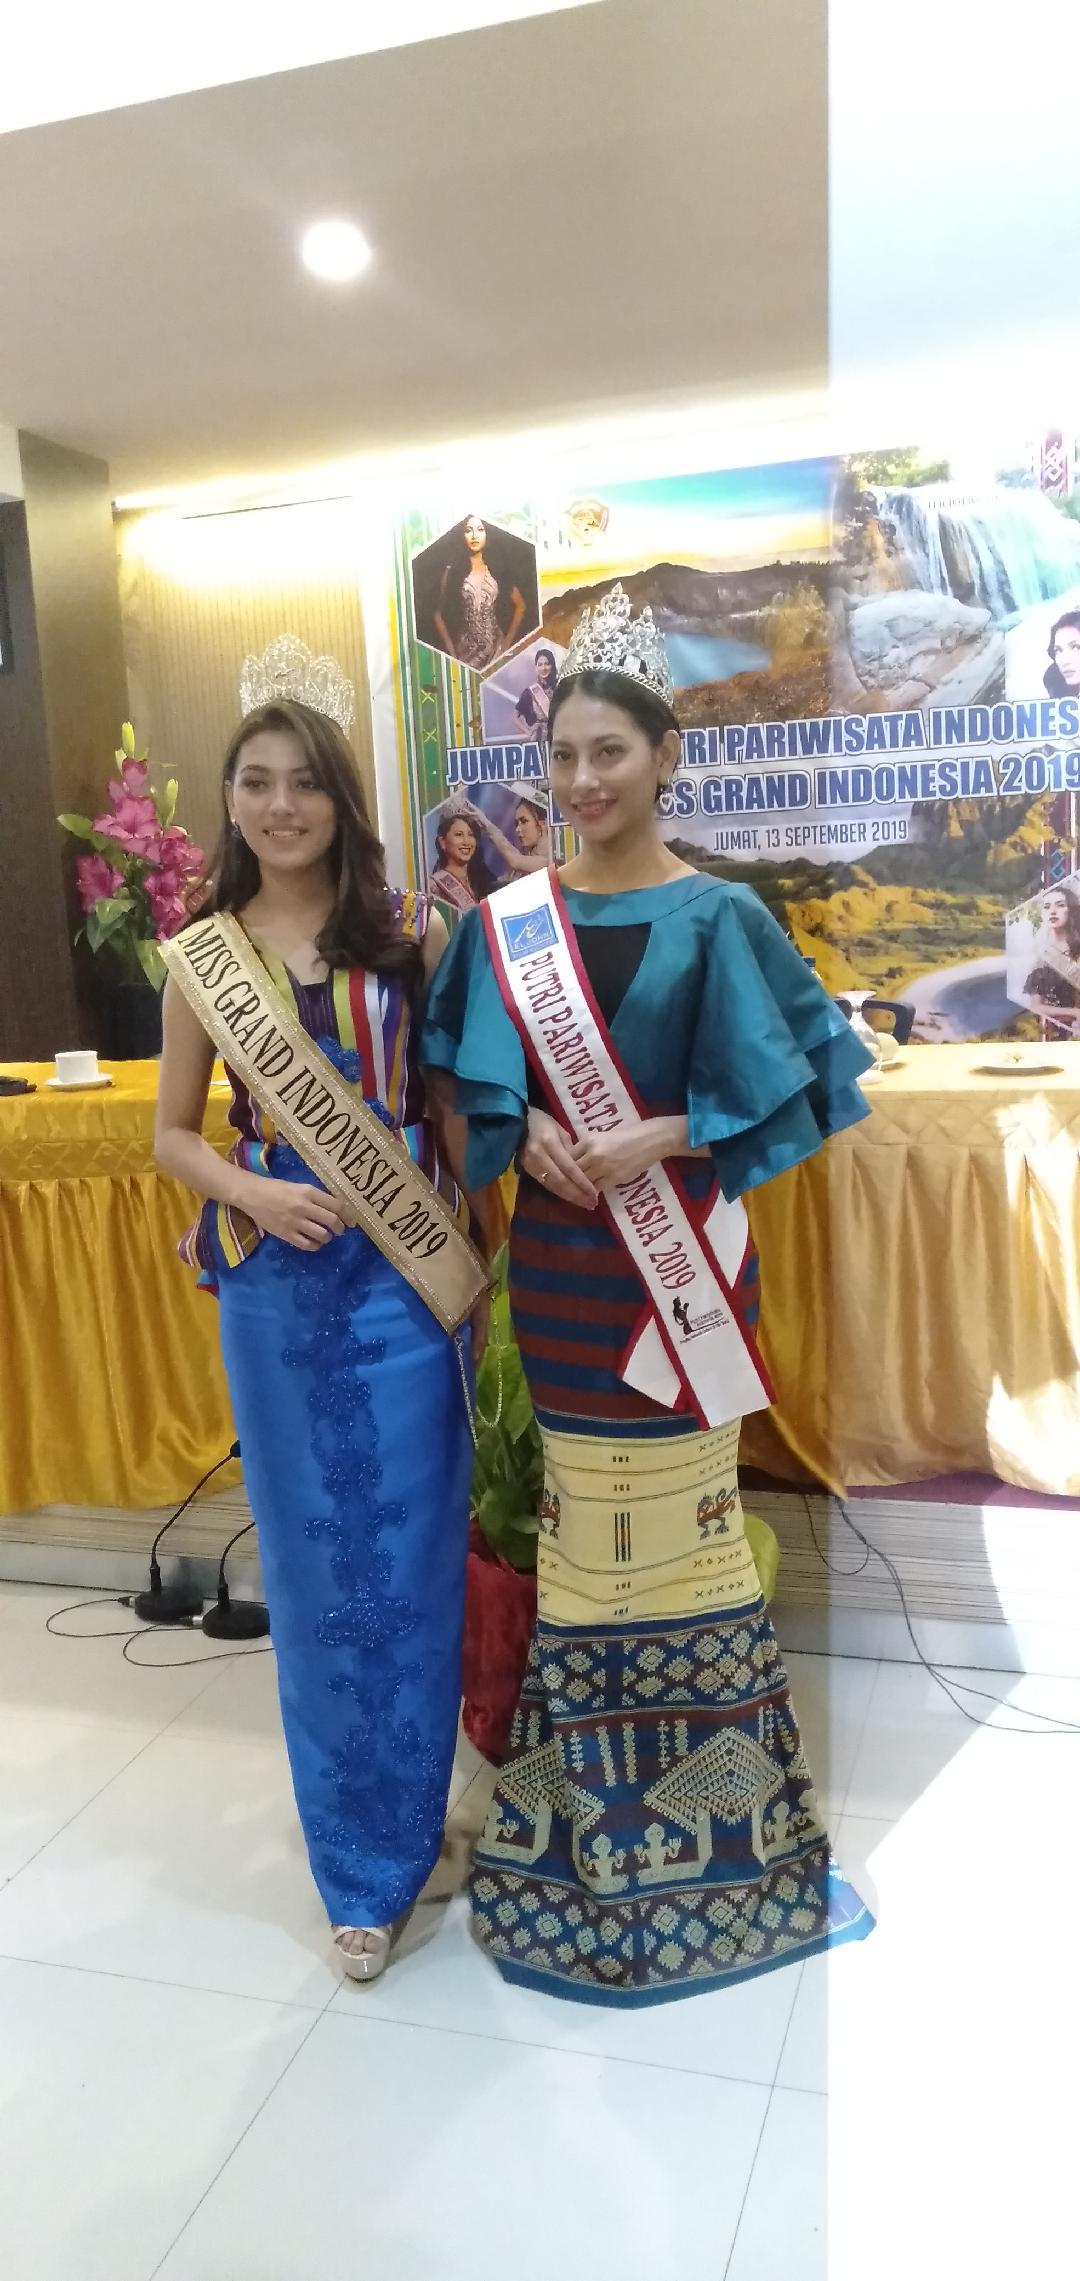 Sarlin dan Mawar Siap Promosi Kekayaan Alam dan Budaya NTT ke Ajang Internasional